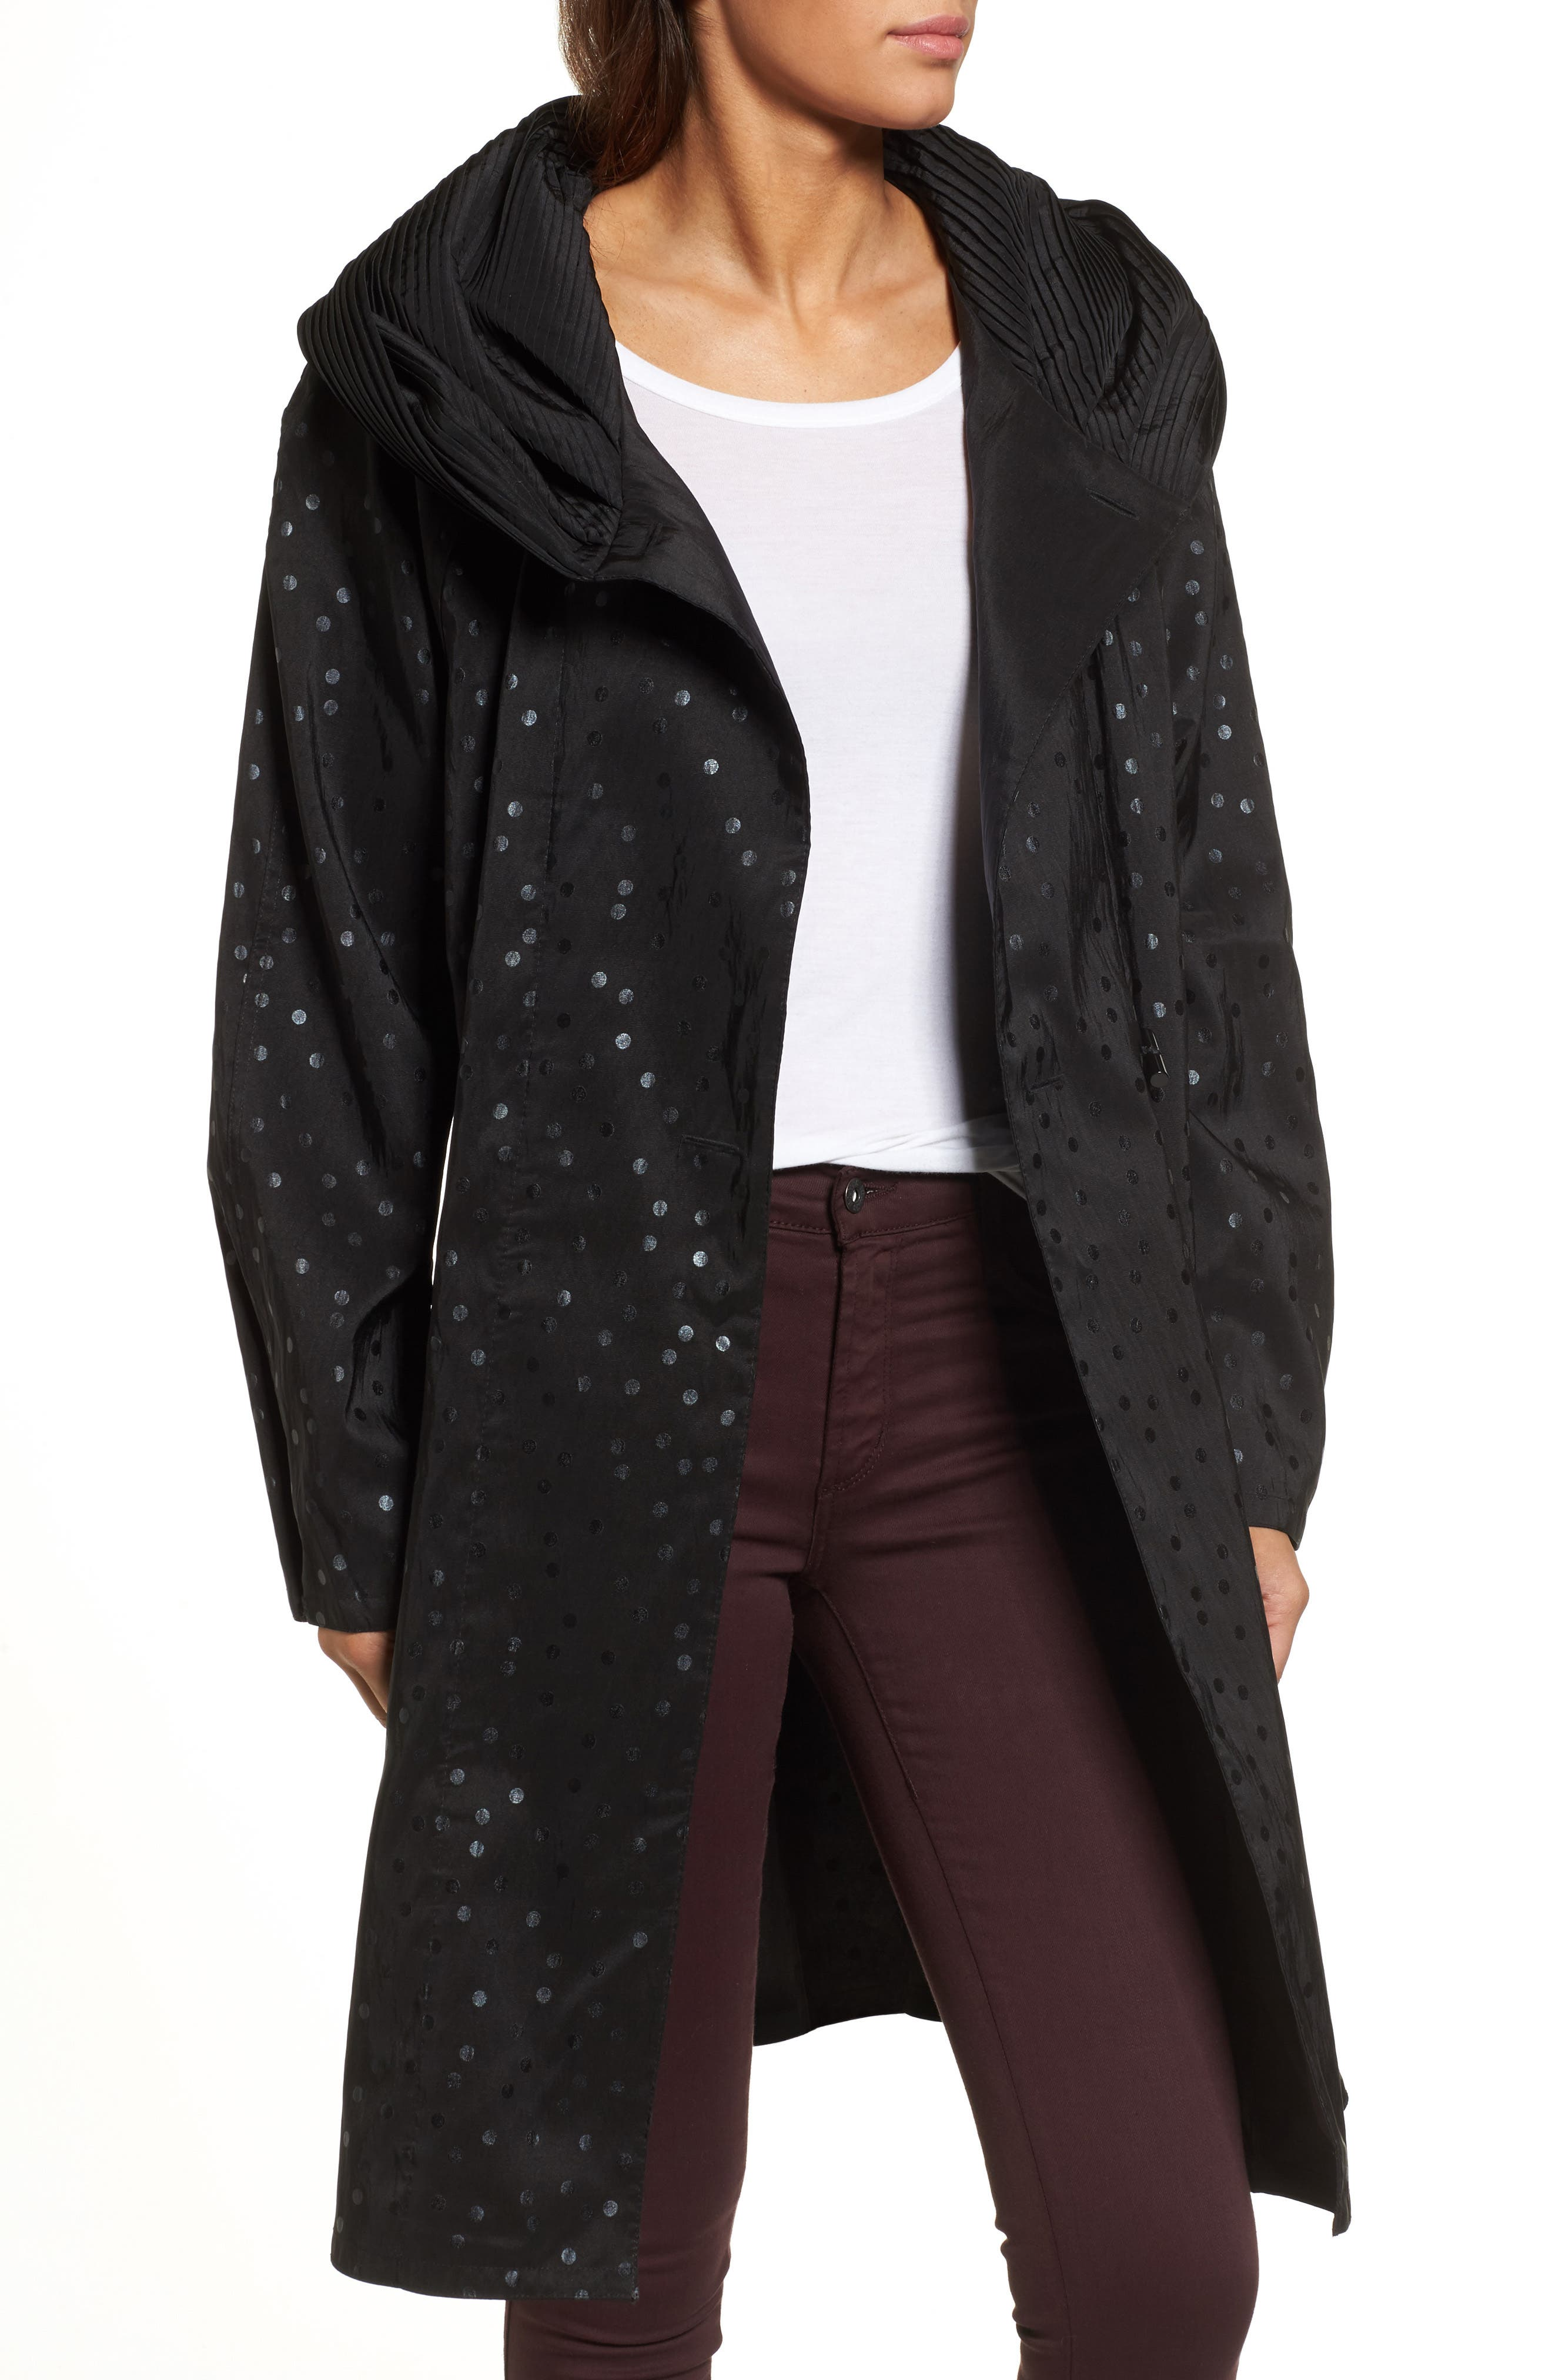 'Donatella' Reversible Dot Pleat Hood Packable Travel Coat,                         Main,                         color, Black Dot